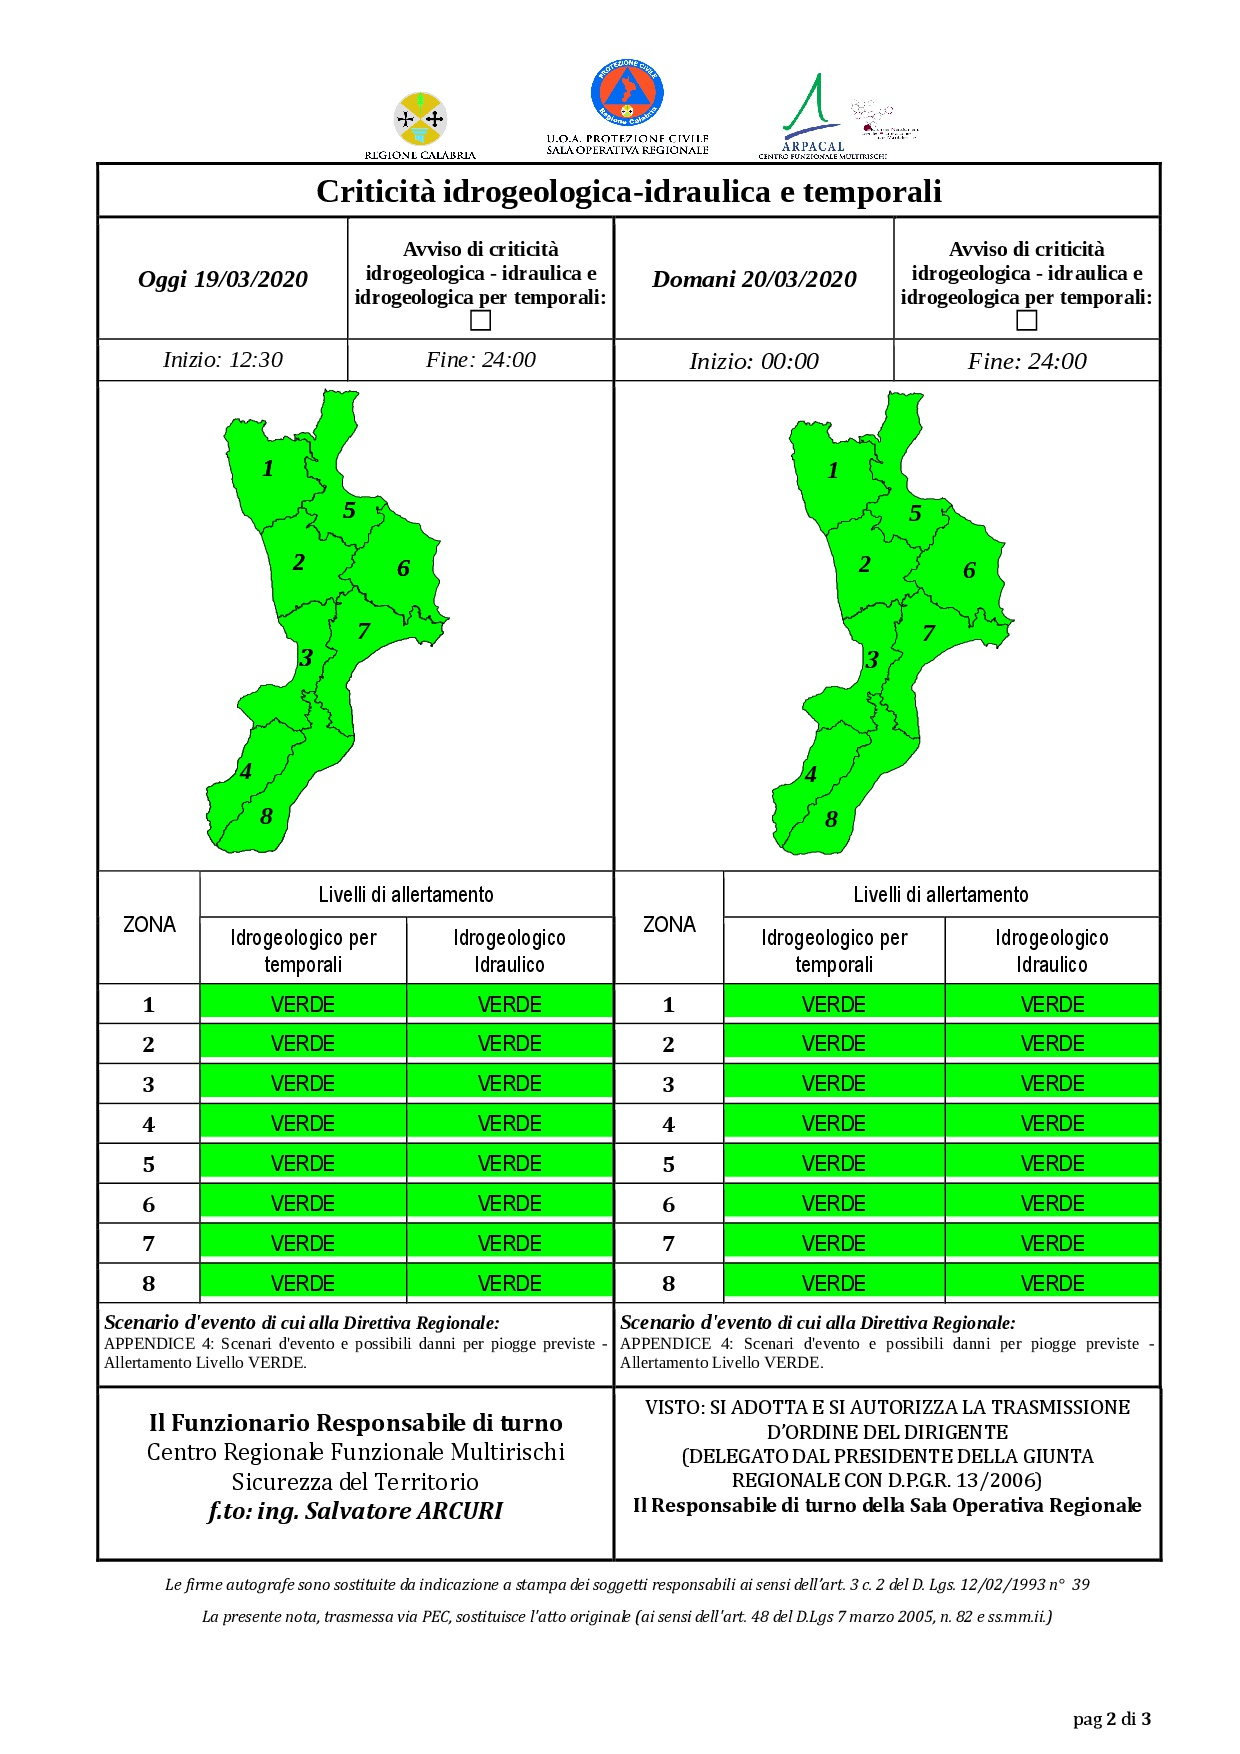 Criticità idrogeologica-idraulica e temporali in Calabria 19-03-2020